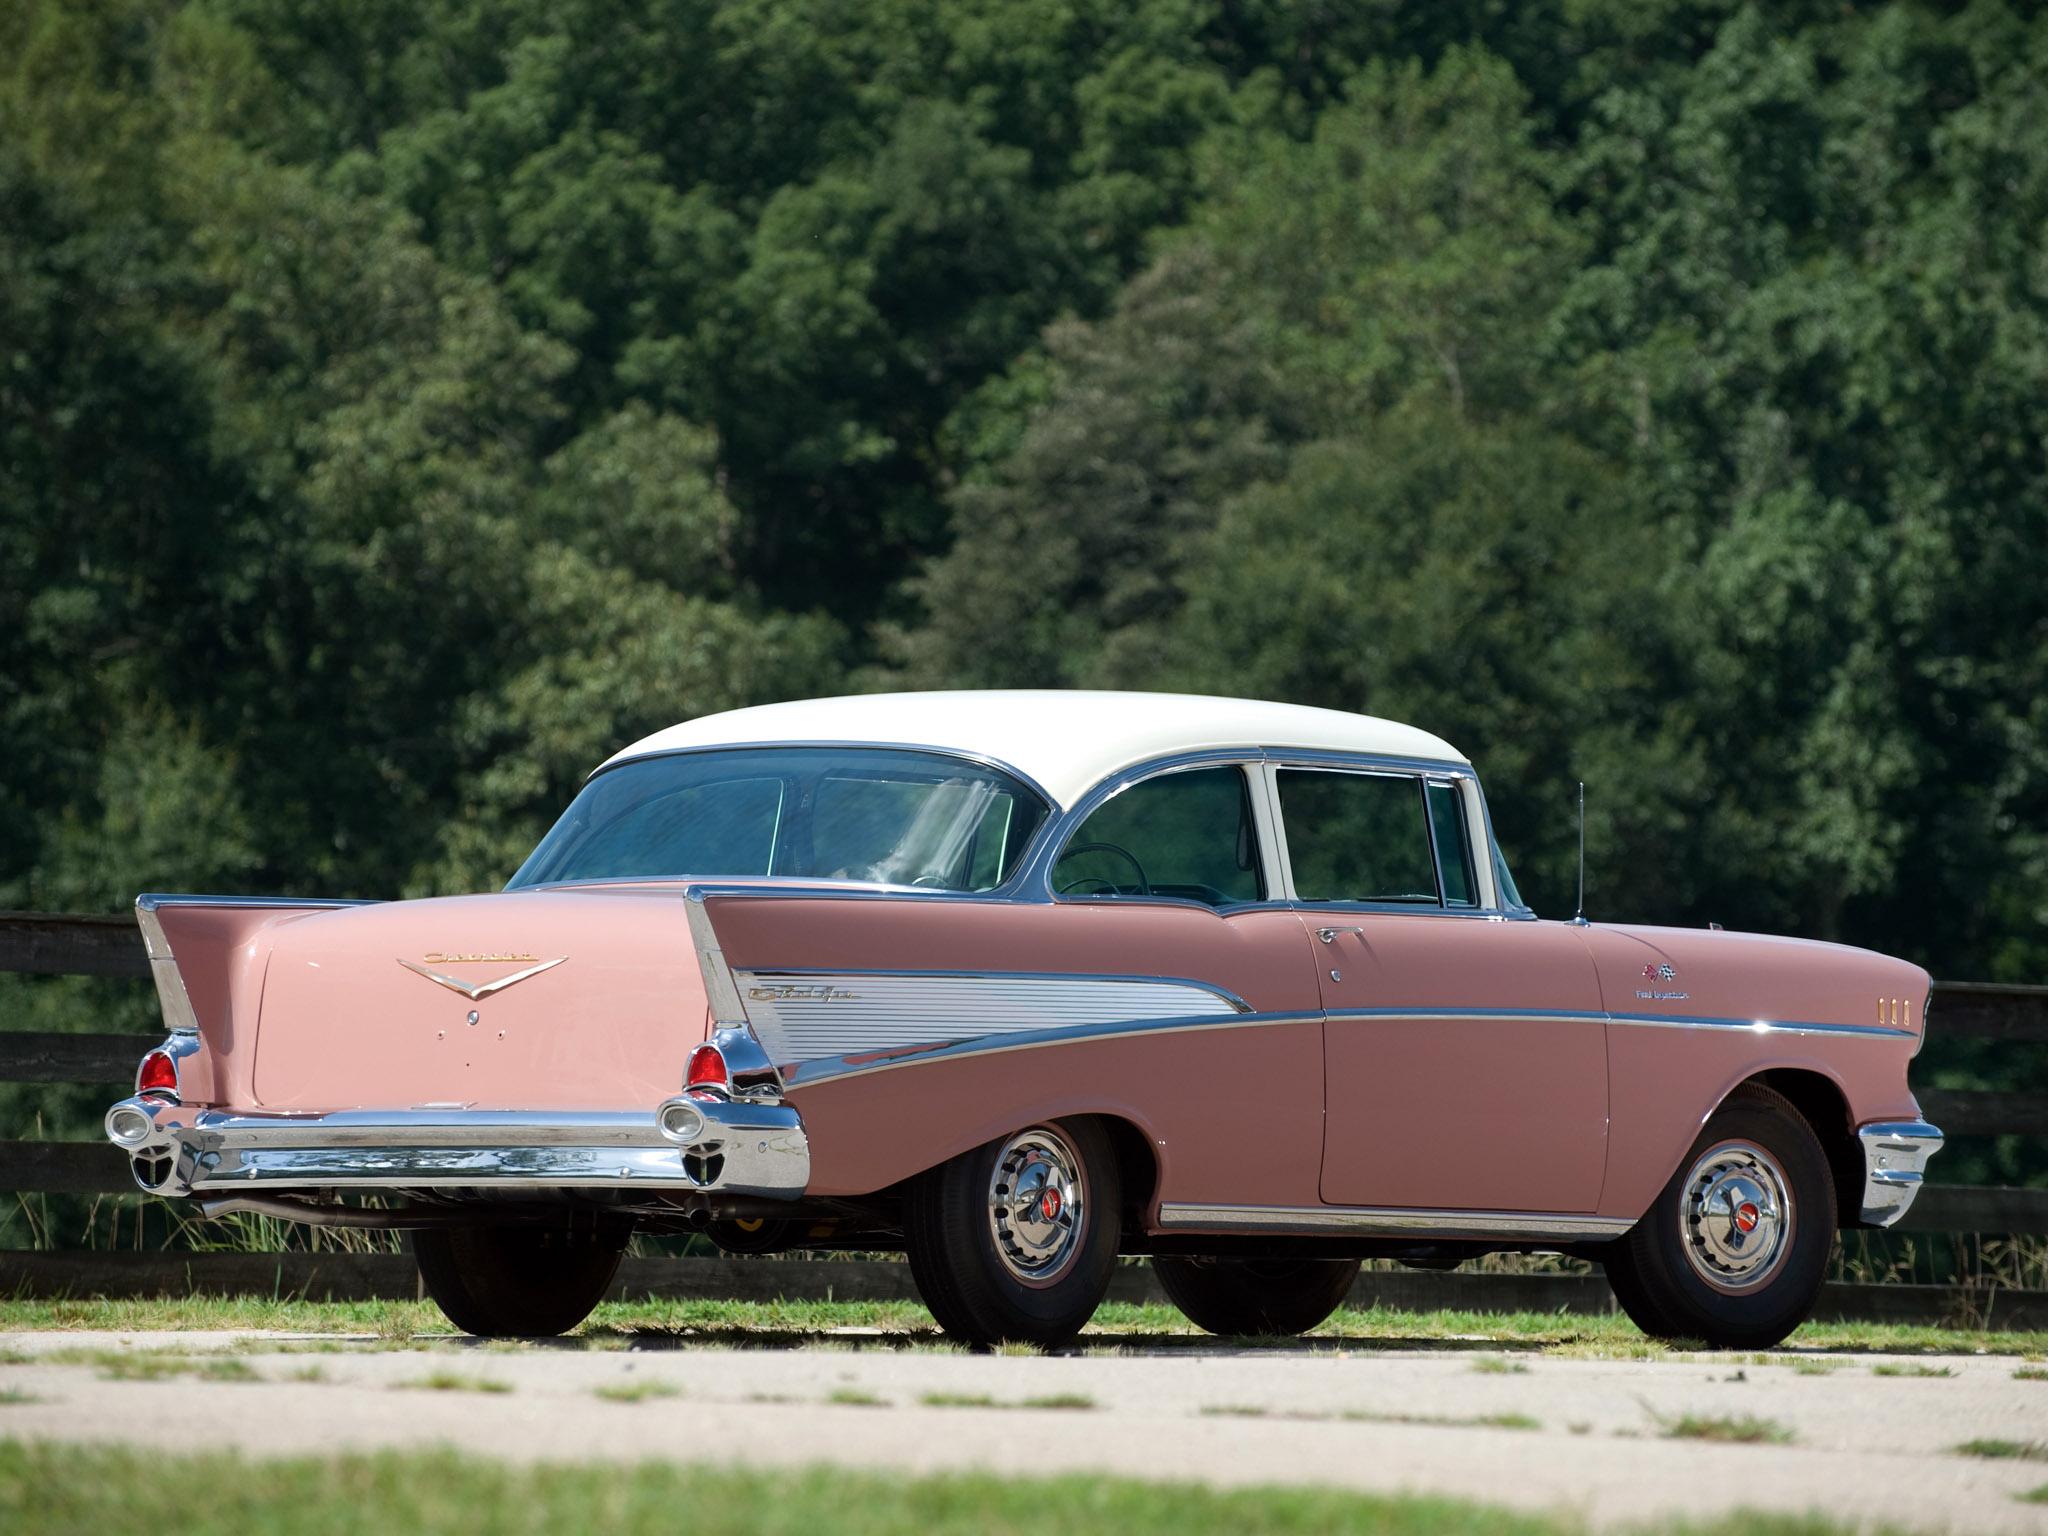 Chevrolet bel air 2 door sedan 1957 chevrolet bel air 2 for 1957 chevy 2 door sedan